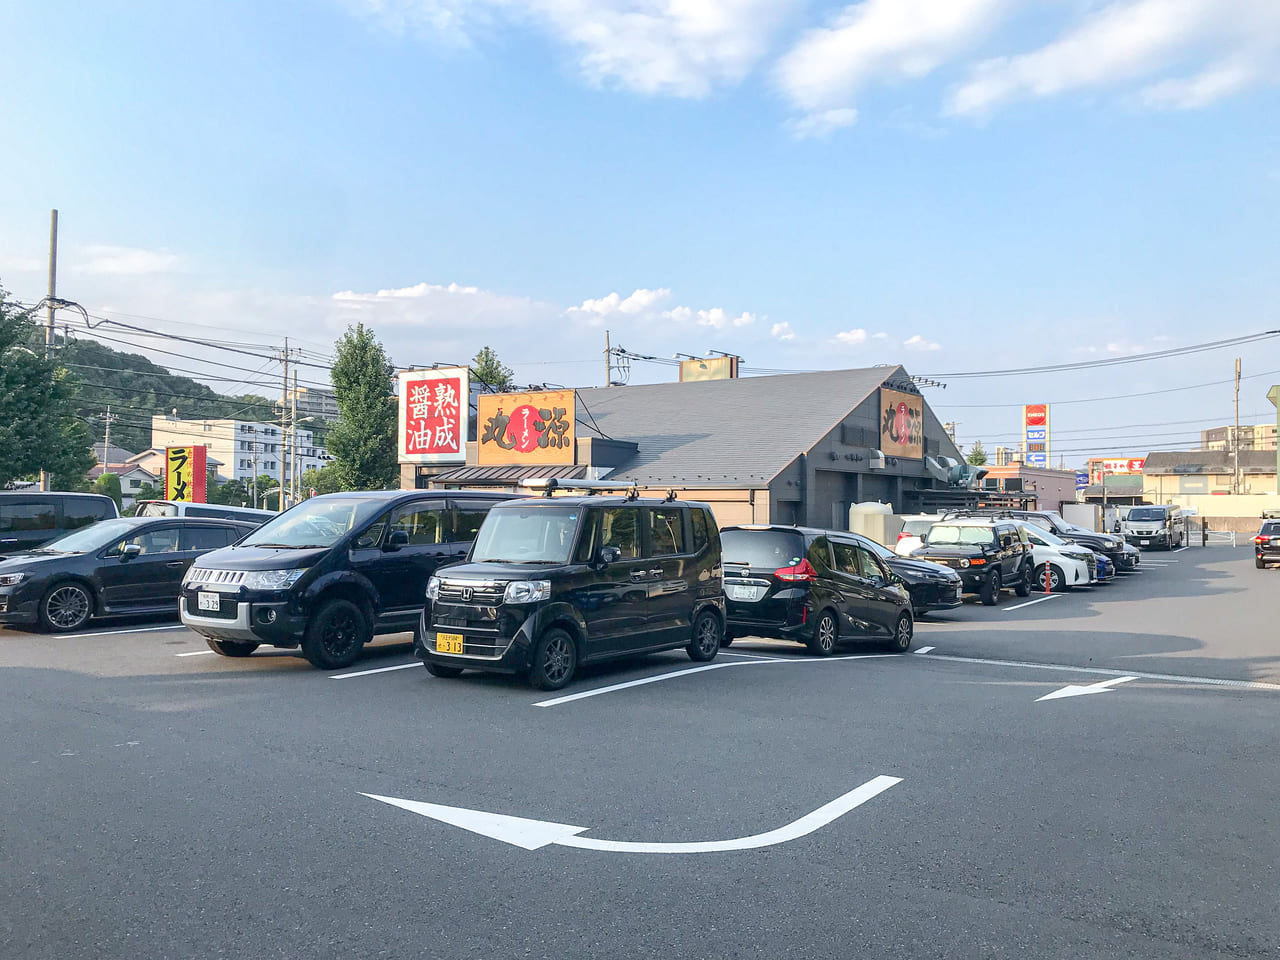 /WILD-1多摩ニュータウン店の駐車場にある丸源ラーメン